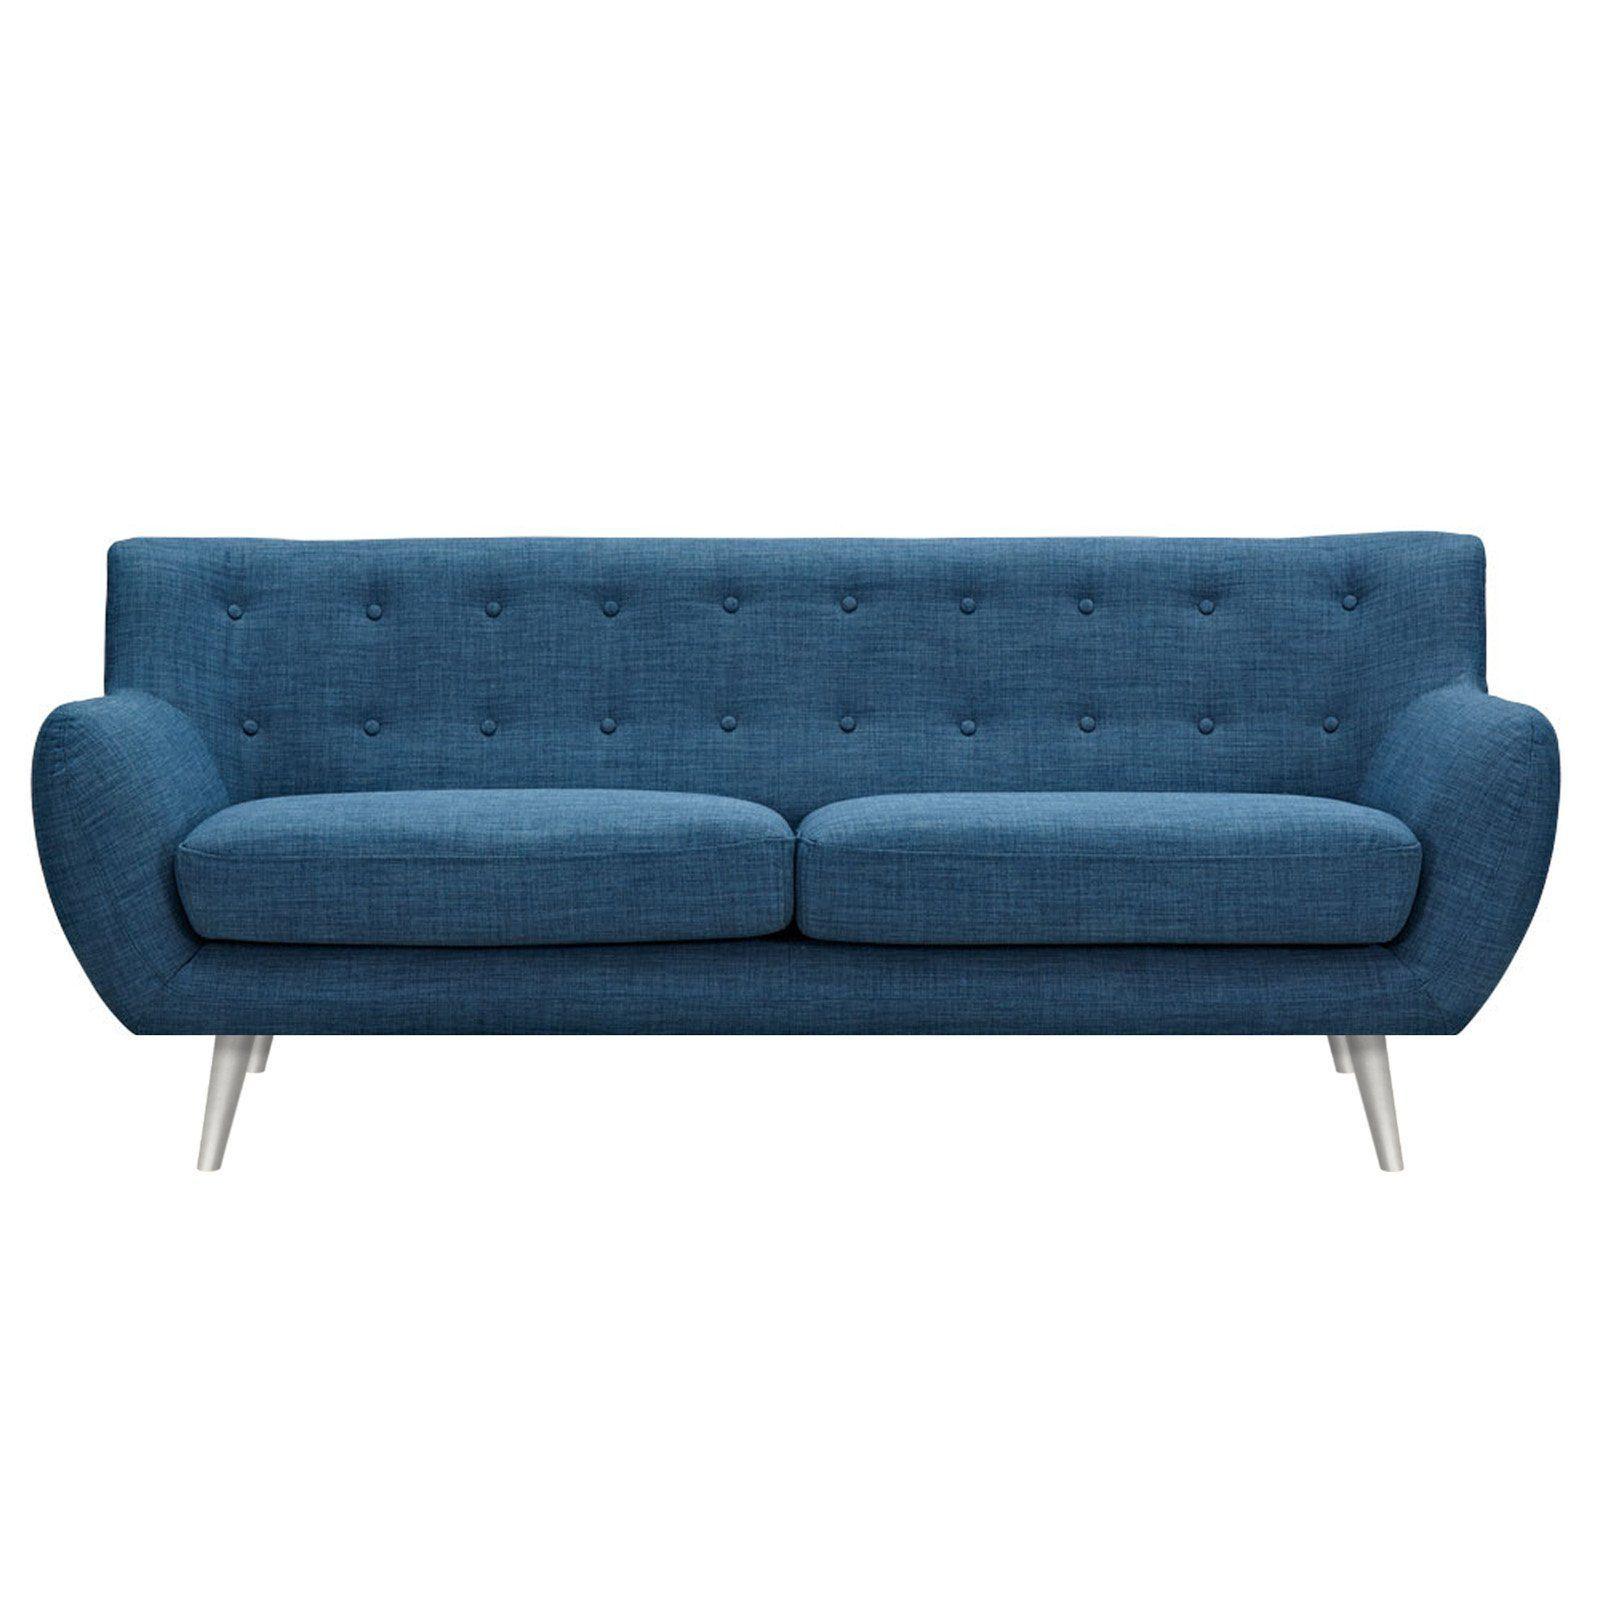 Anke Mid Century Modern Sofa   Stone Blue